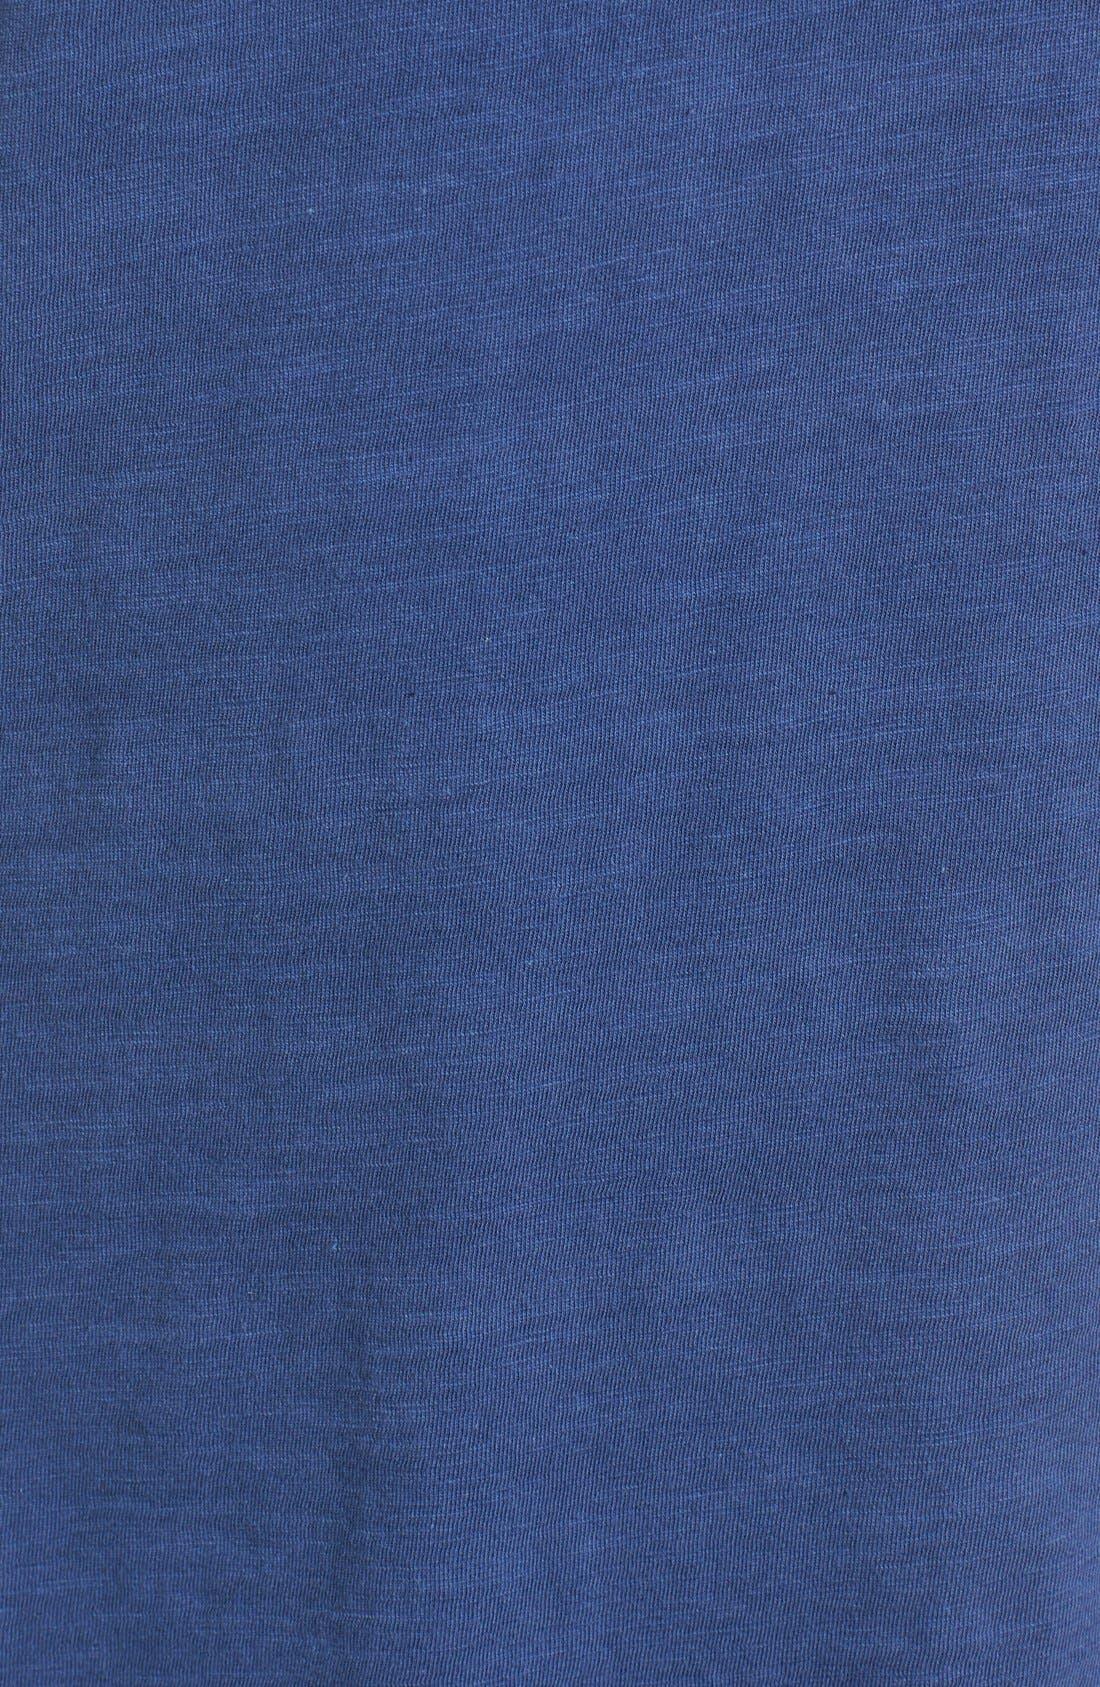 Organic Cotton V-Neck Tee,                             Alternate thumbnail 5, color,                             Denim